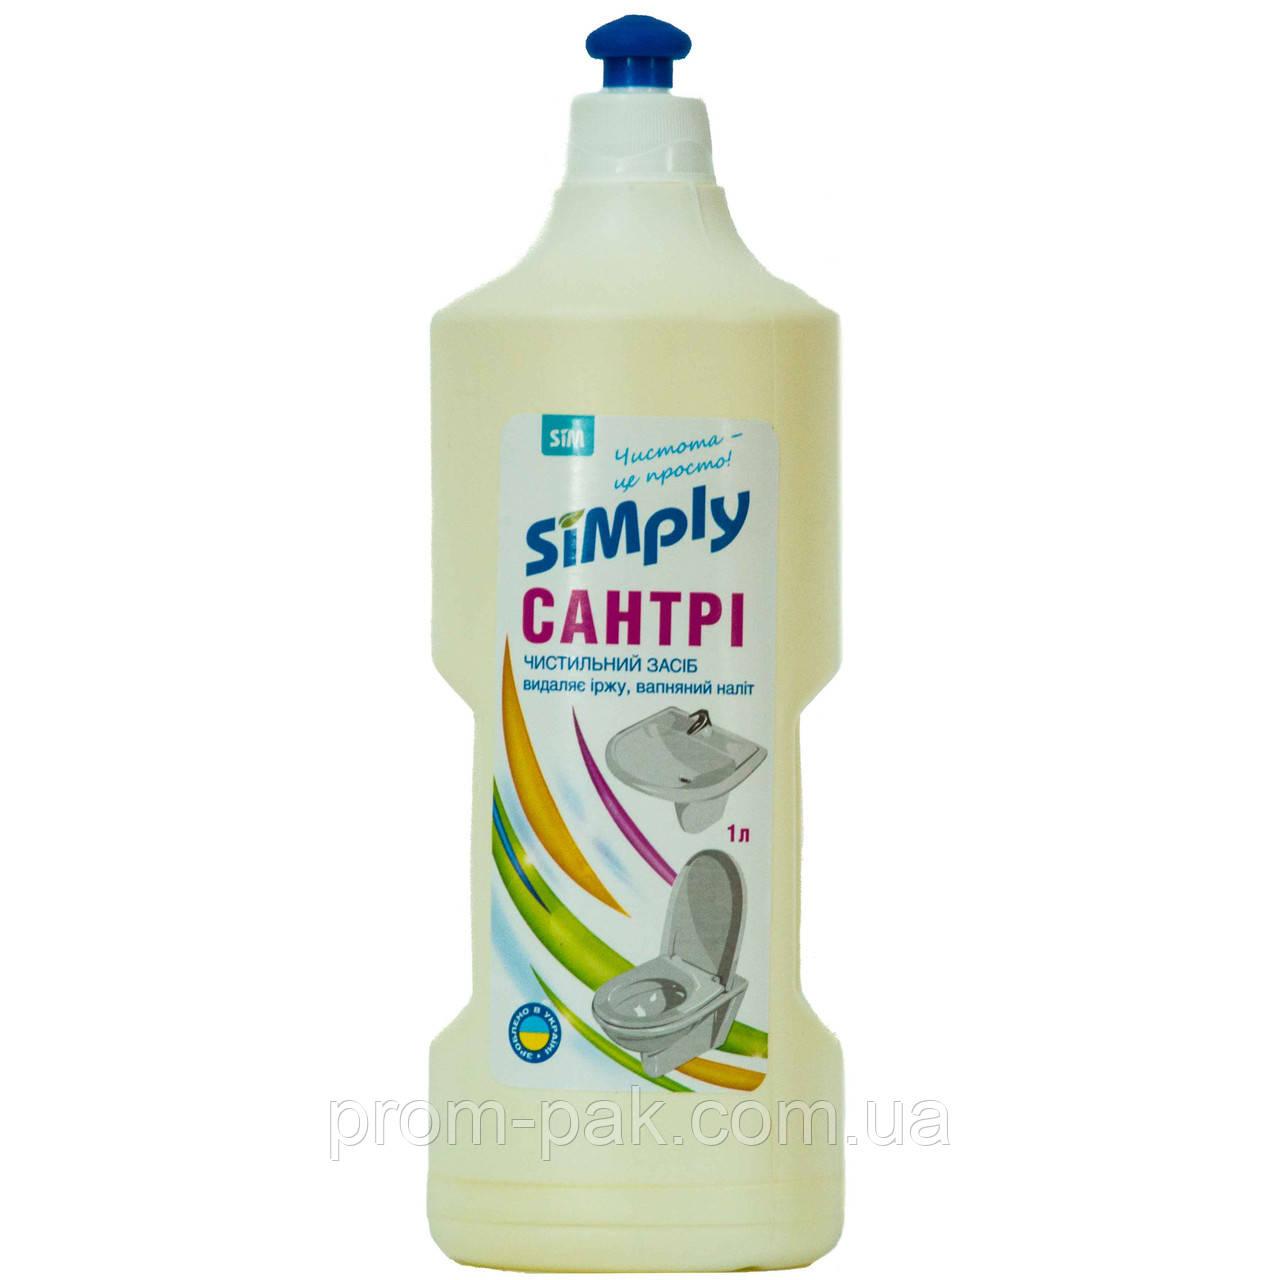 Сантри универсал моющее средство SIMply